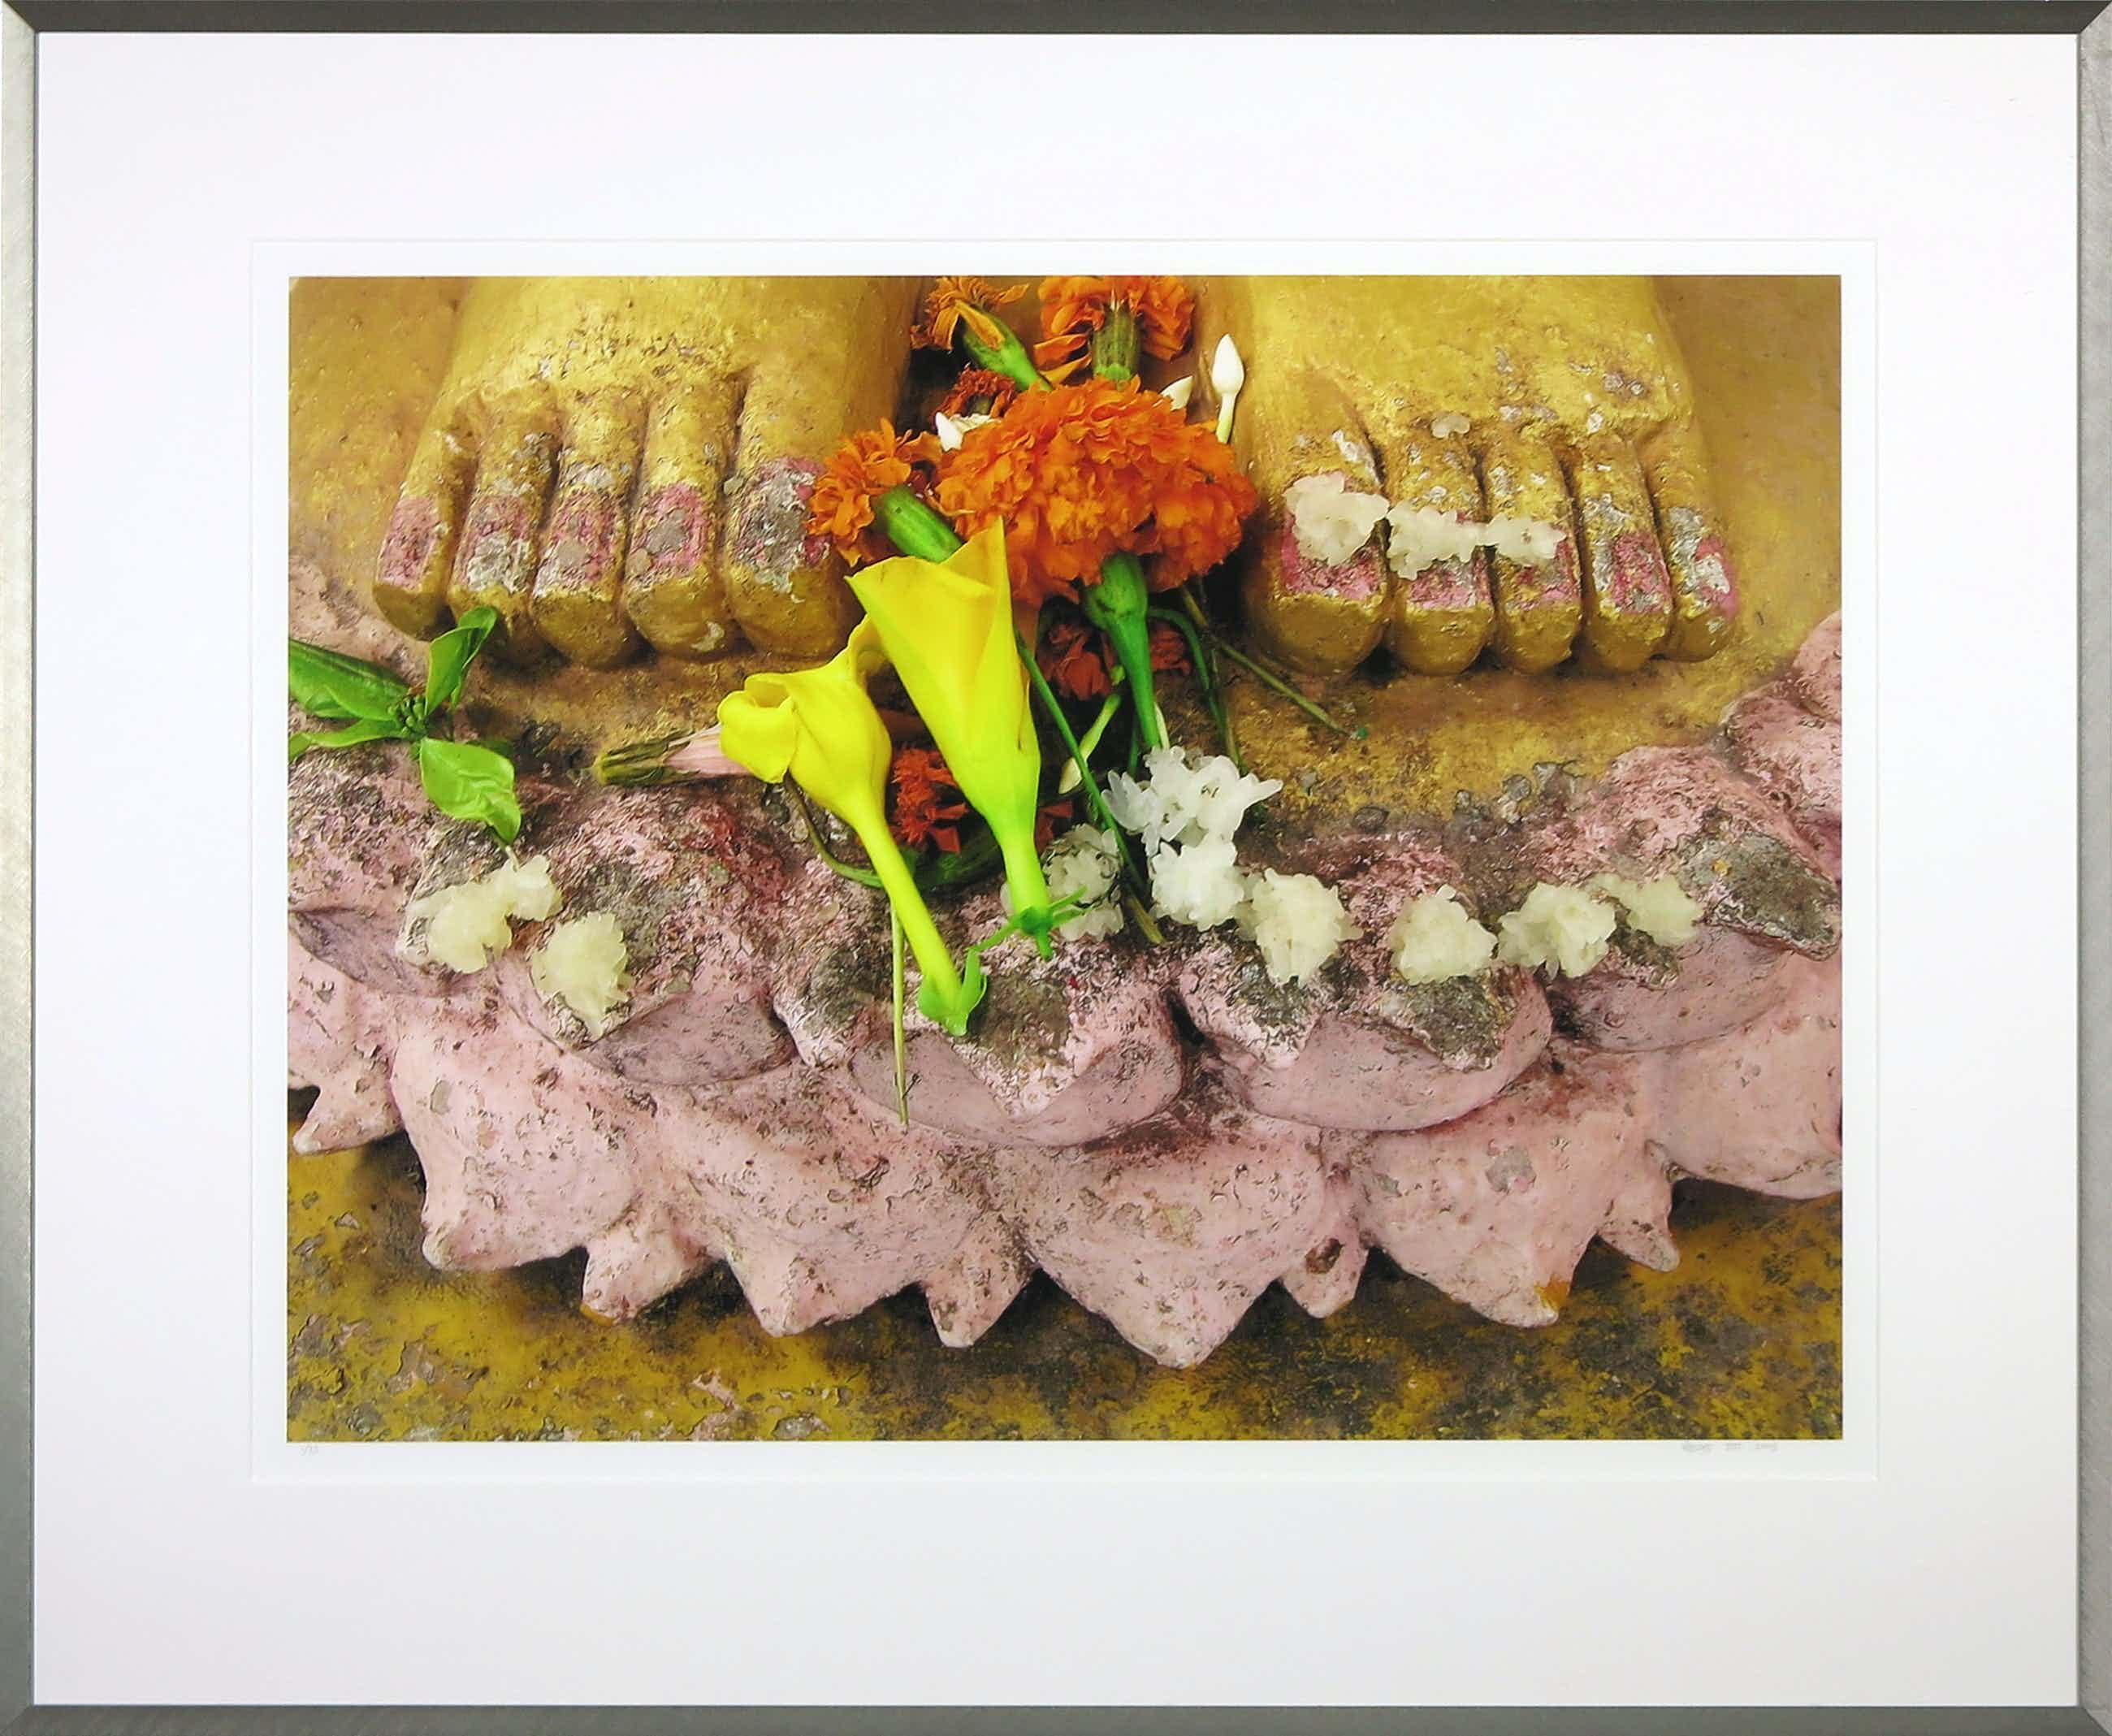 Mark Verdoes - Foto, Buddha love flowerfeet - Ingelijst kopen? Bied vanaf 60!